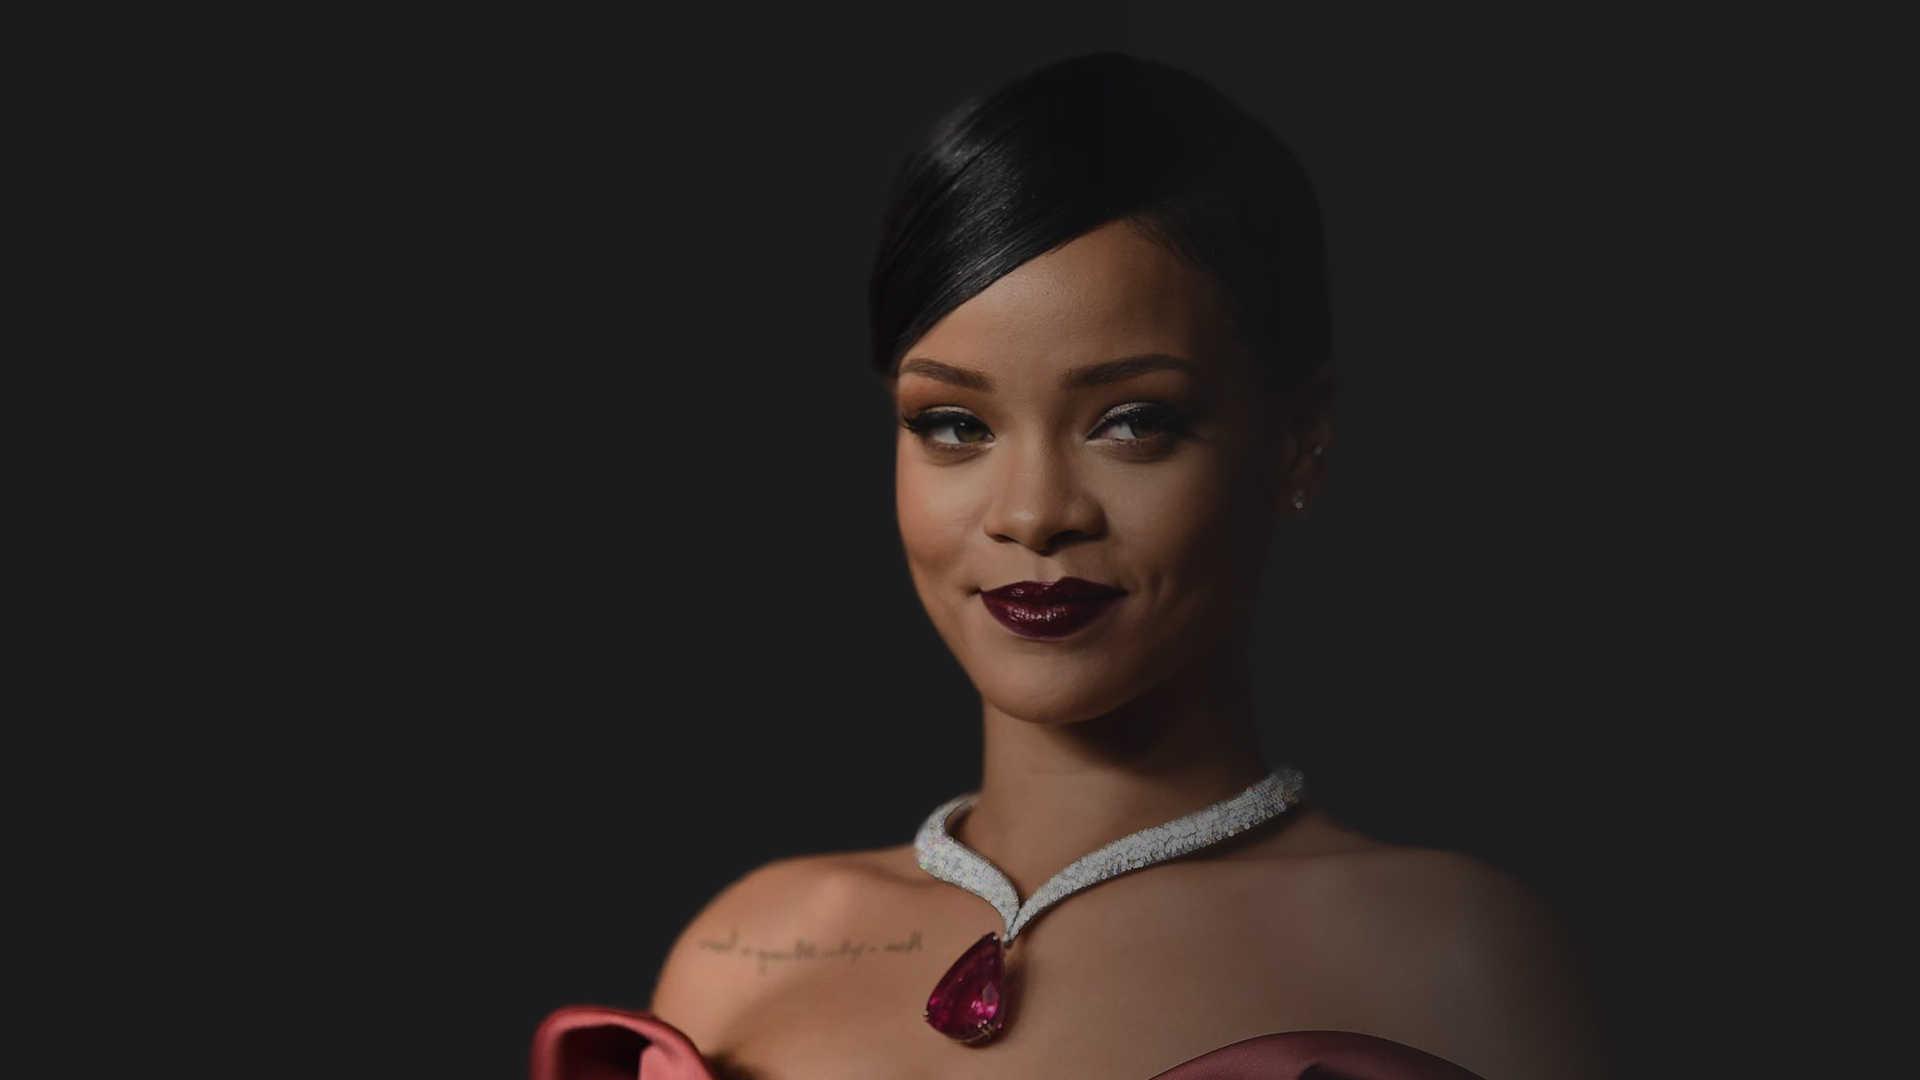 Wallpaper Rihanna 2015 HD Wallpapers 1080p Upload at February 26 1920x1080